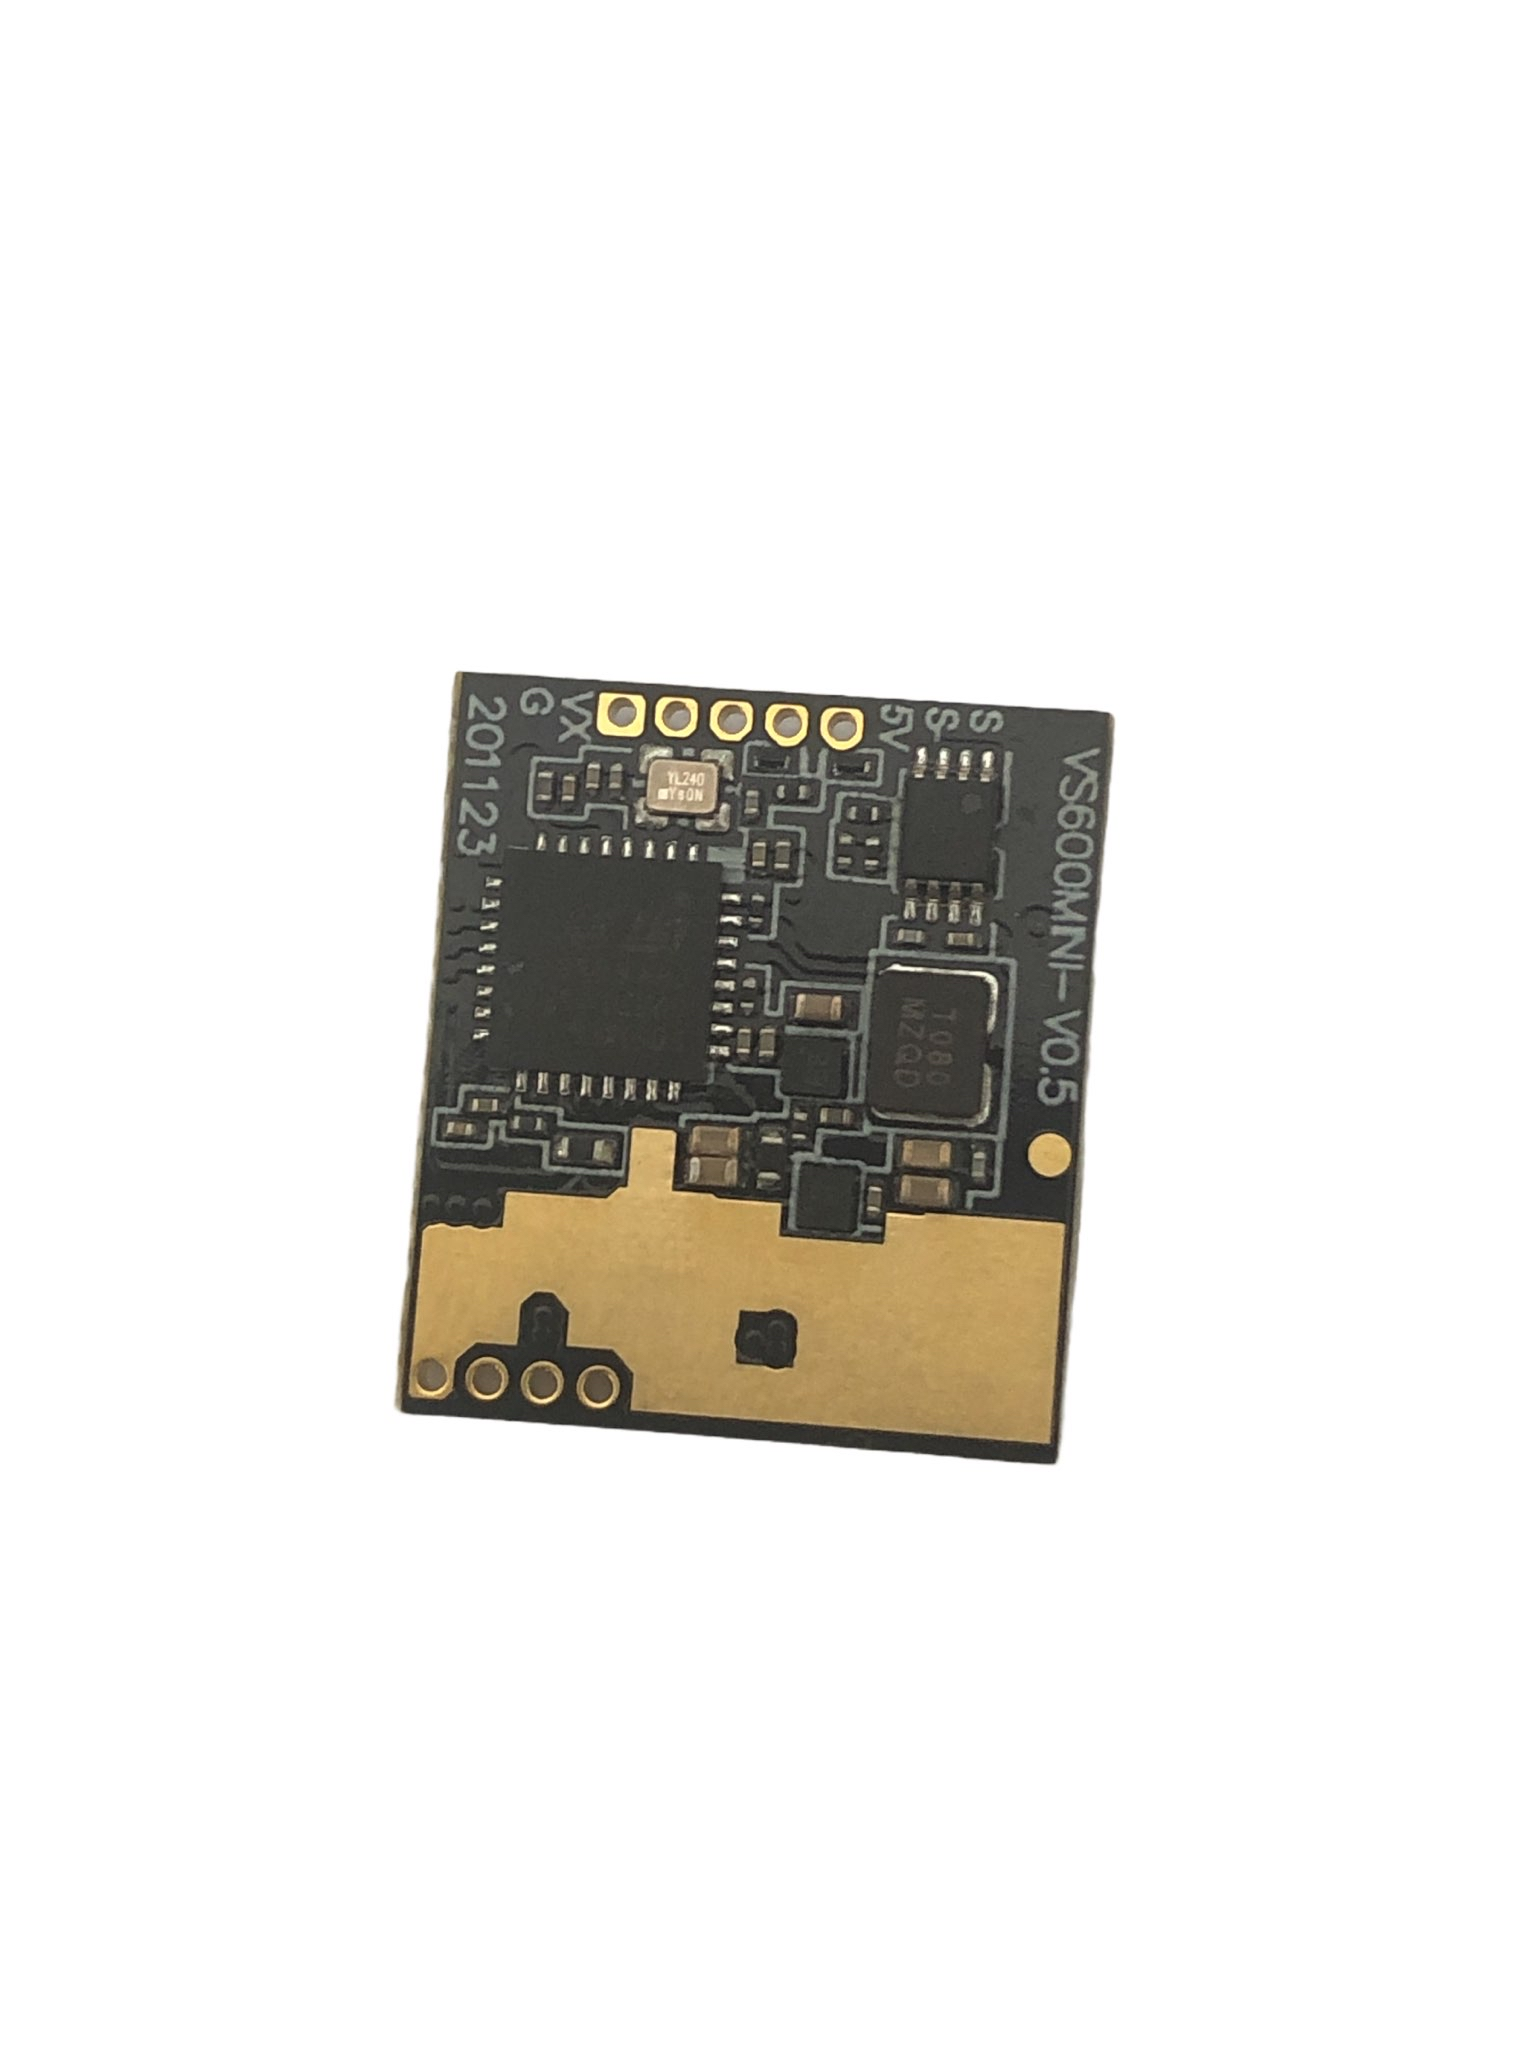 FrSky VTX--Mini【AIRSTAGEオリジナル日本語説明書付】<業務電波利用可能5.7Ghz技適取得済>日本特別仕様